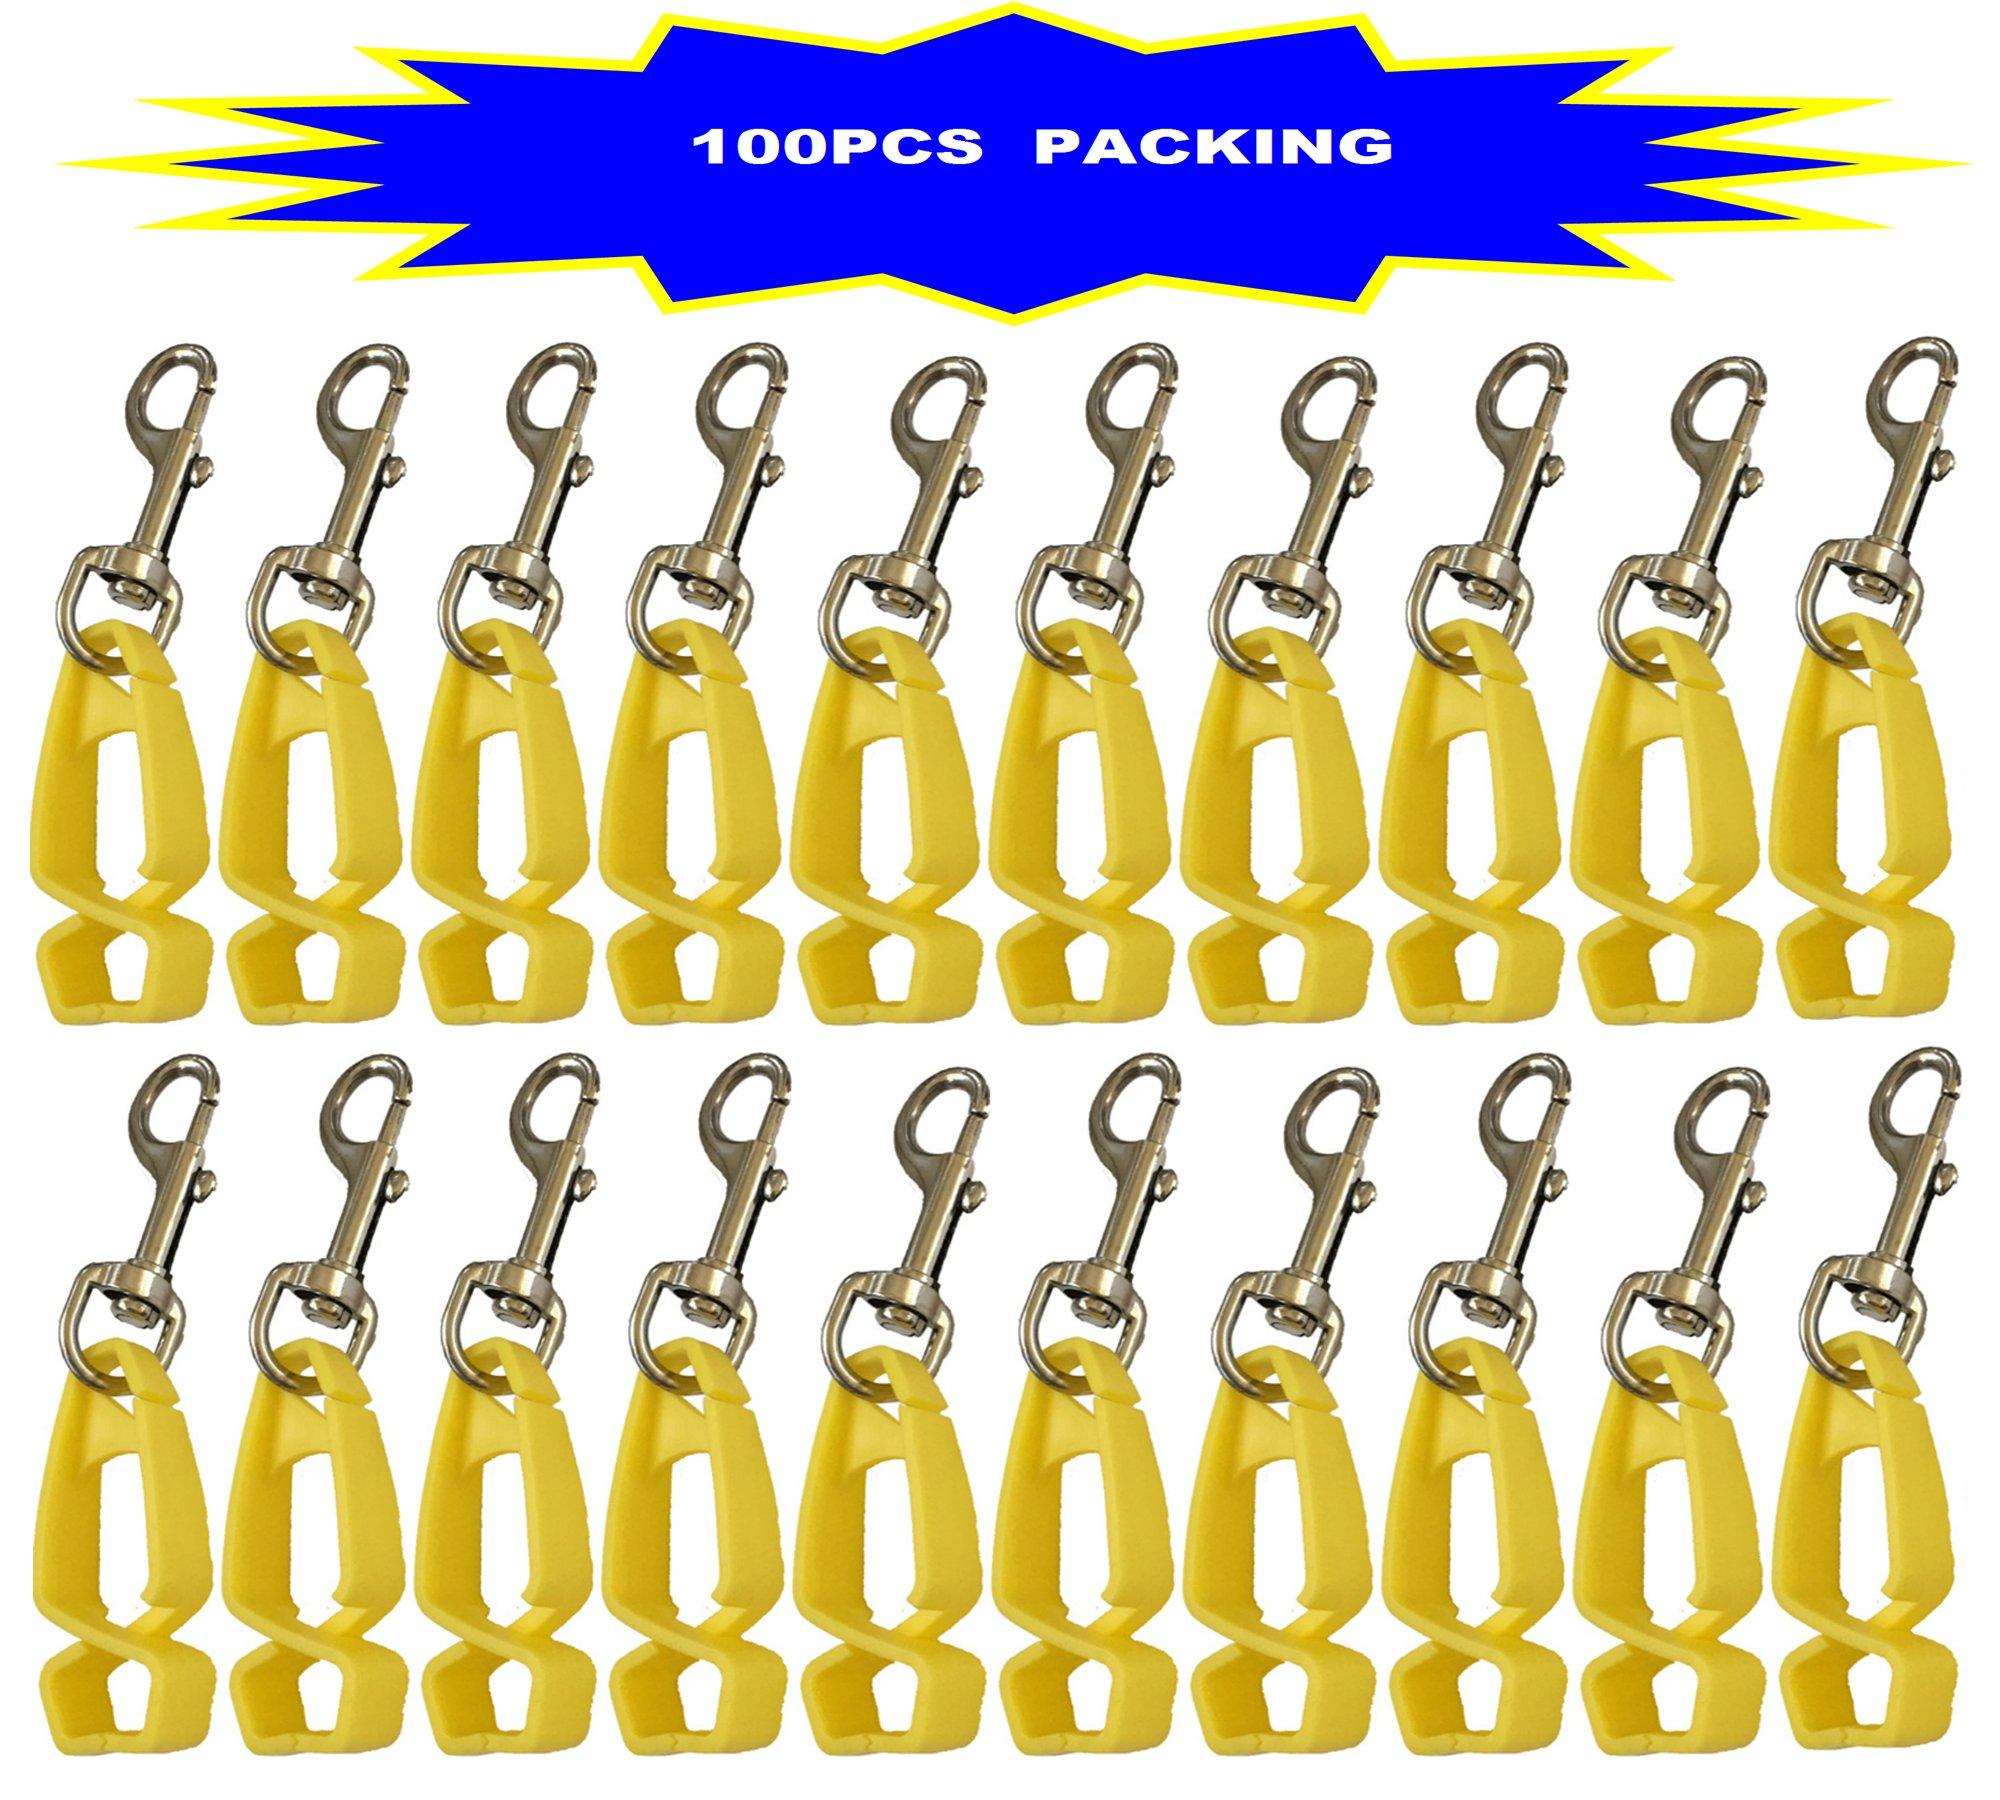 100Pcs Pack AT07-100Y Yellow Sino-Max Glove Clip,Glove Grabber Holder Work Safety Breakaway Safety Gear Belt Loop, Belt Clip Glove Keeper, Neon POM, Reduce Hand Injury, Attach Gloves, Towels, Glasses by Sinomax (Image #1)